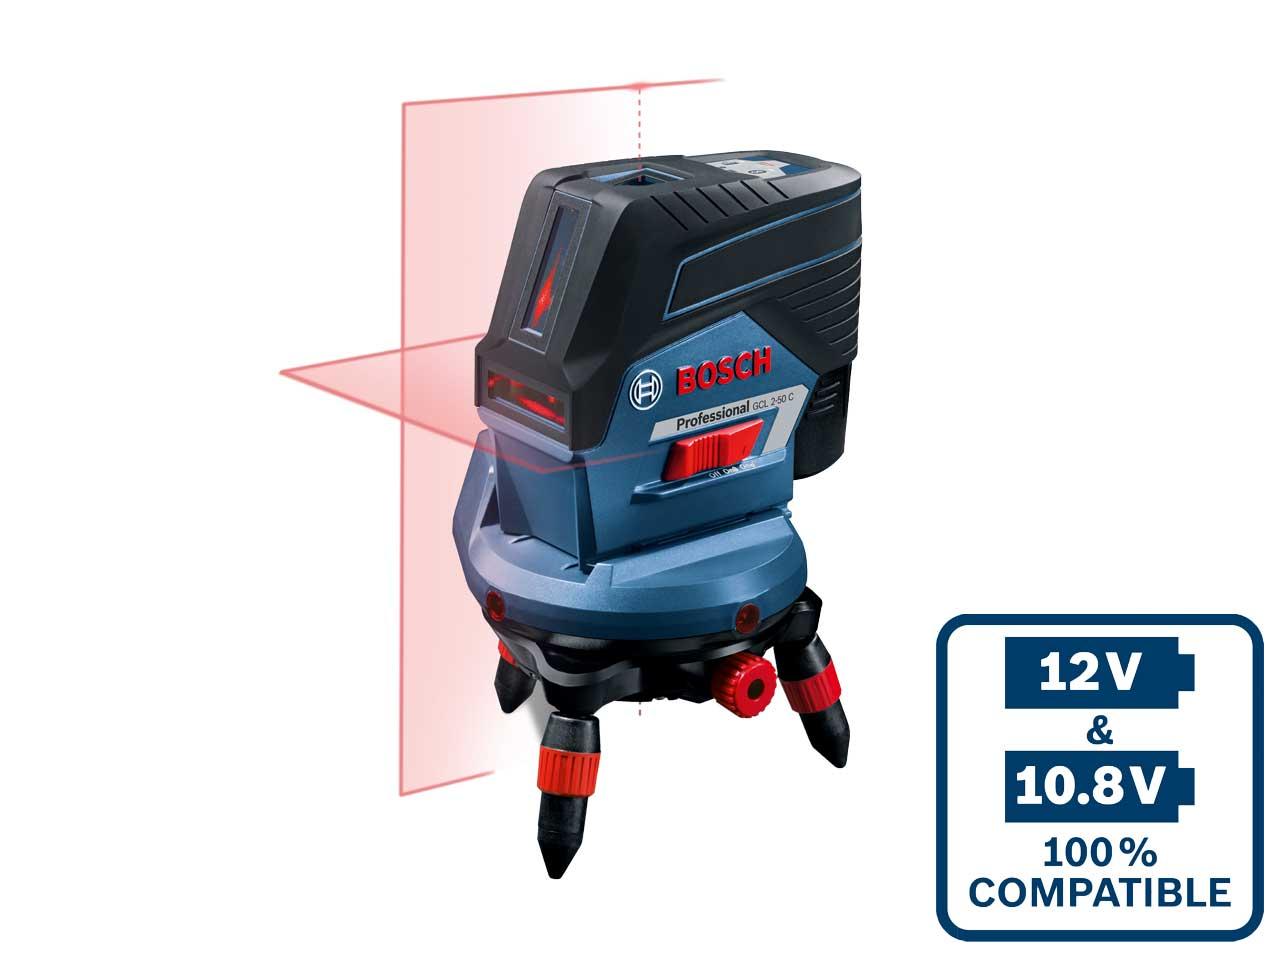 Bosch Gcl250cgb 12v 2 0 Ah Rm2 Combi Laser Green Beam